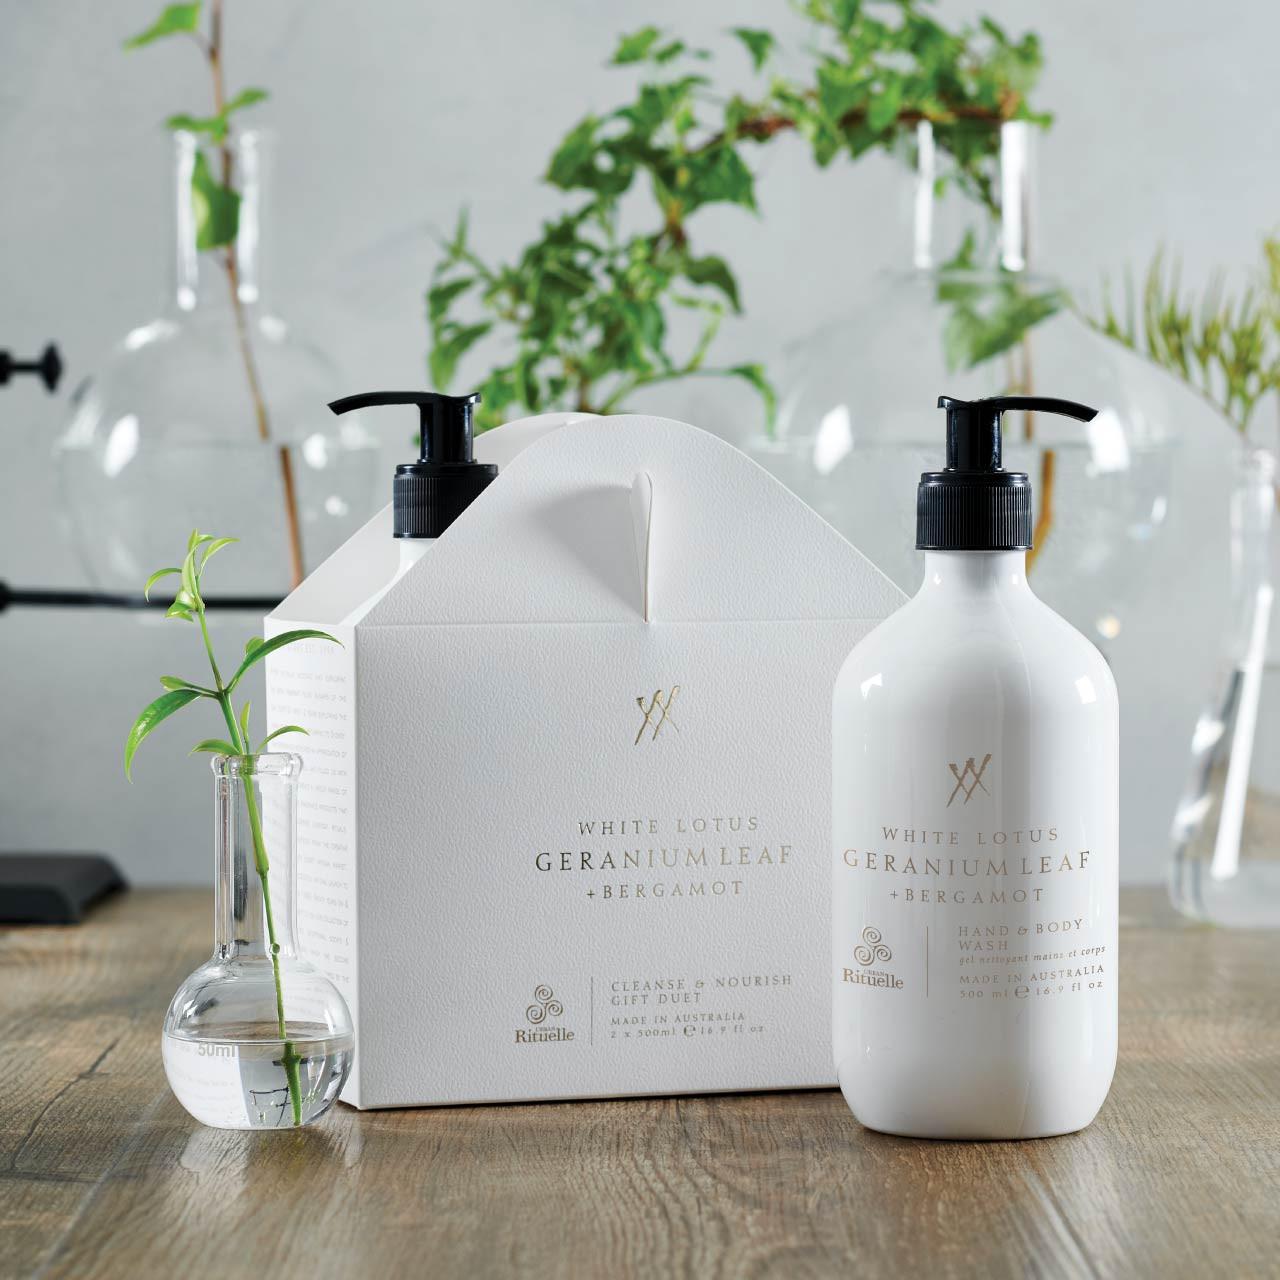 Alchemy - White Lotus, Geranium Leaf & Bergamot - Cleanse & Nourish Gift Duet - Urban Rituelle